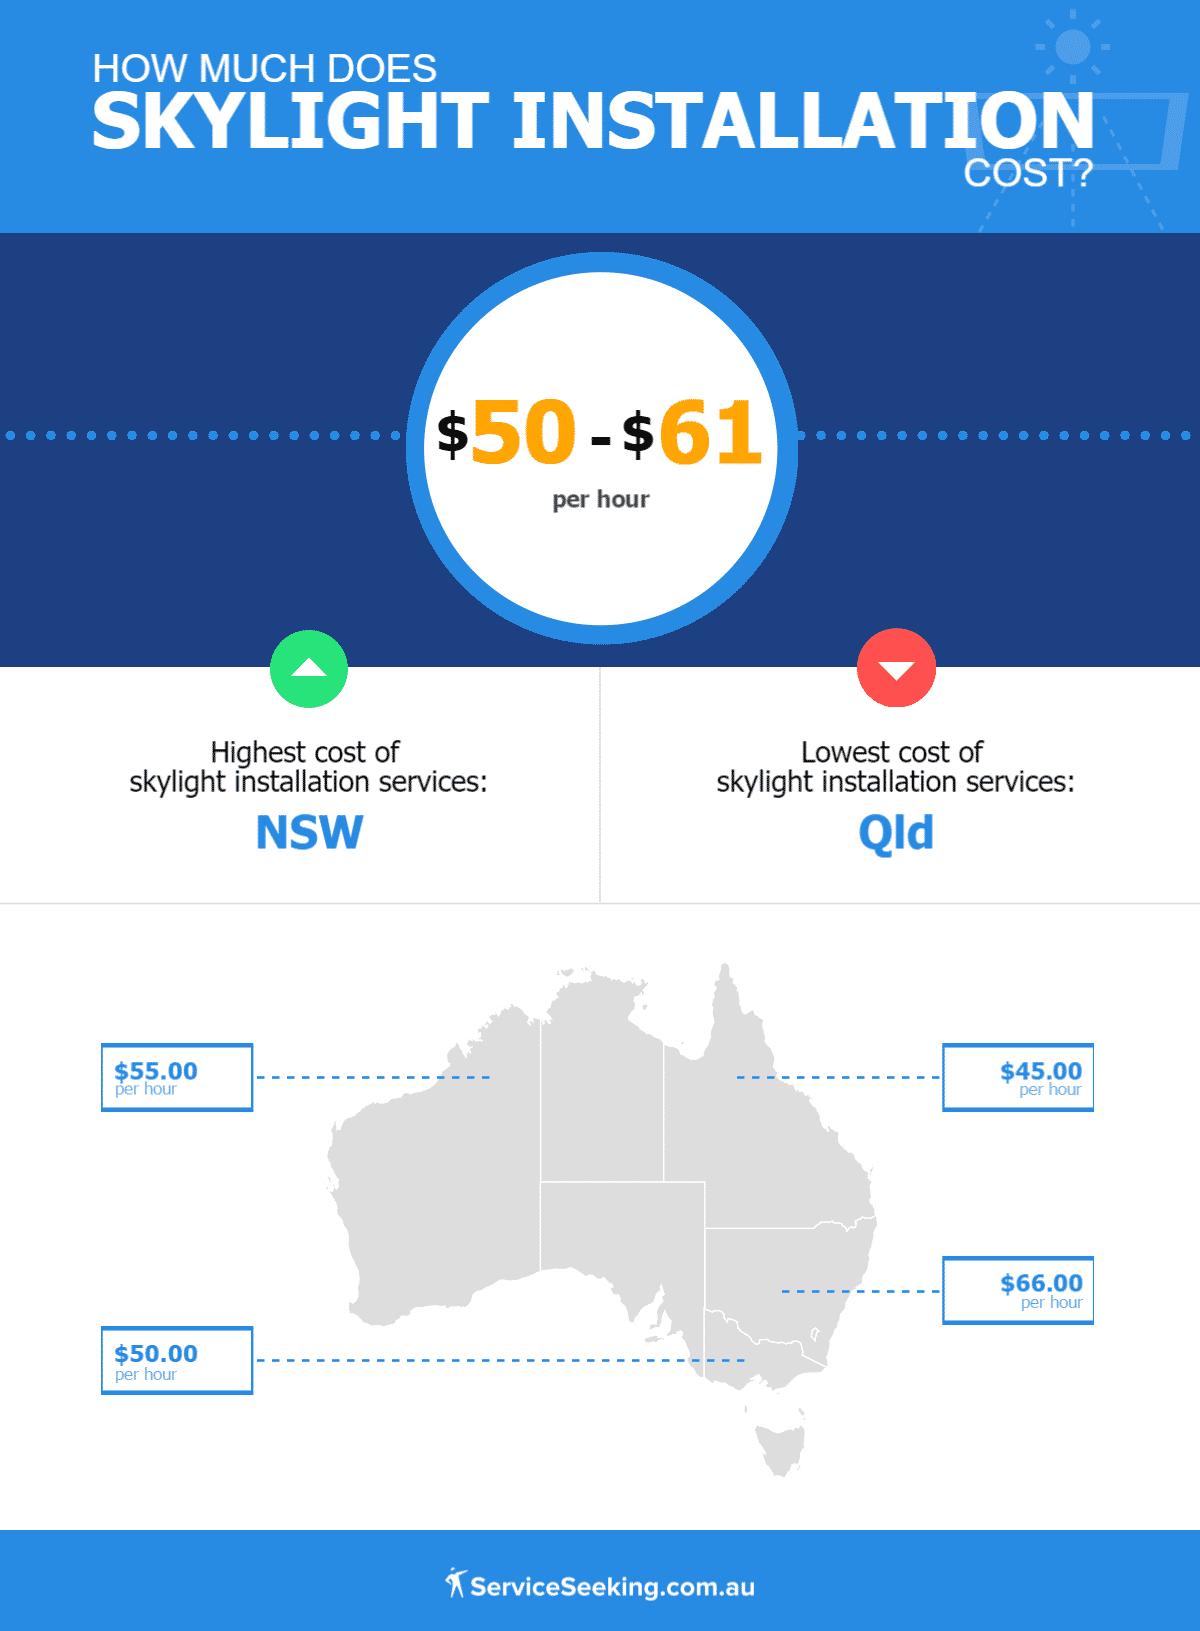 Cost of skylights